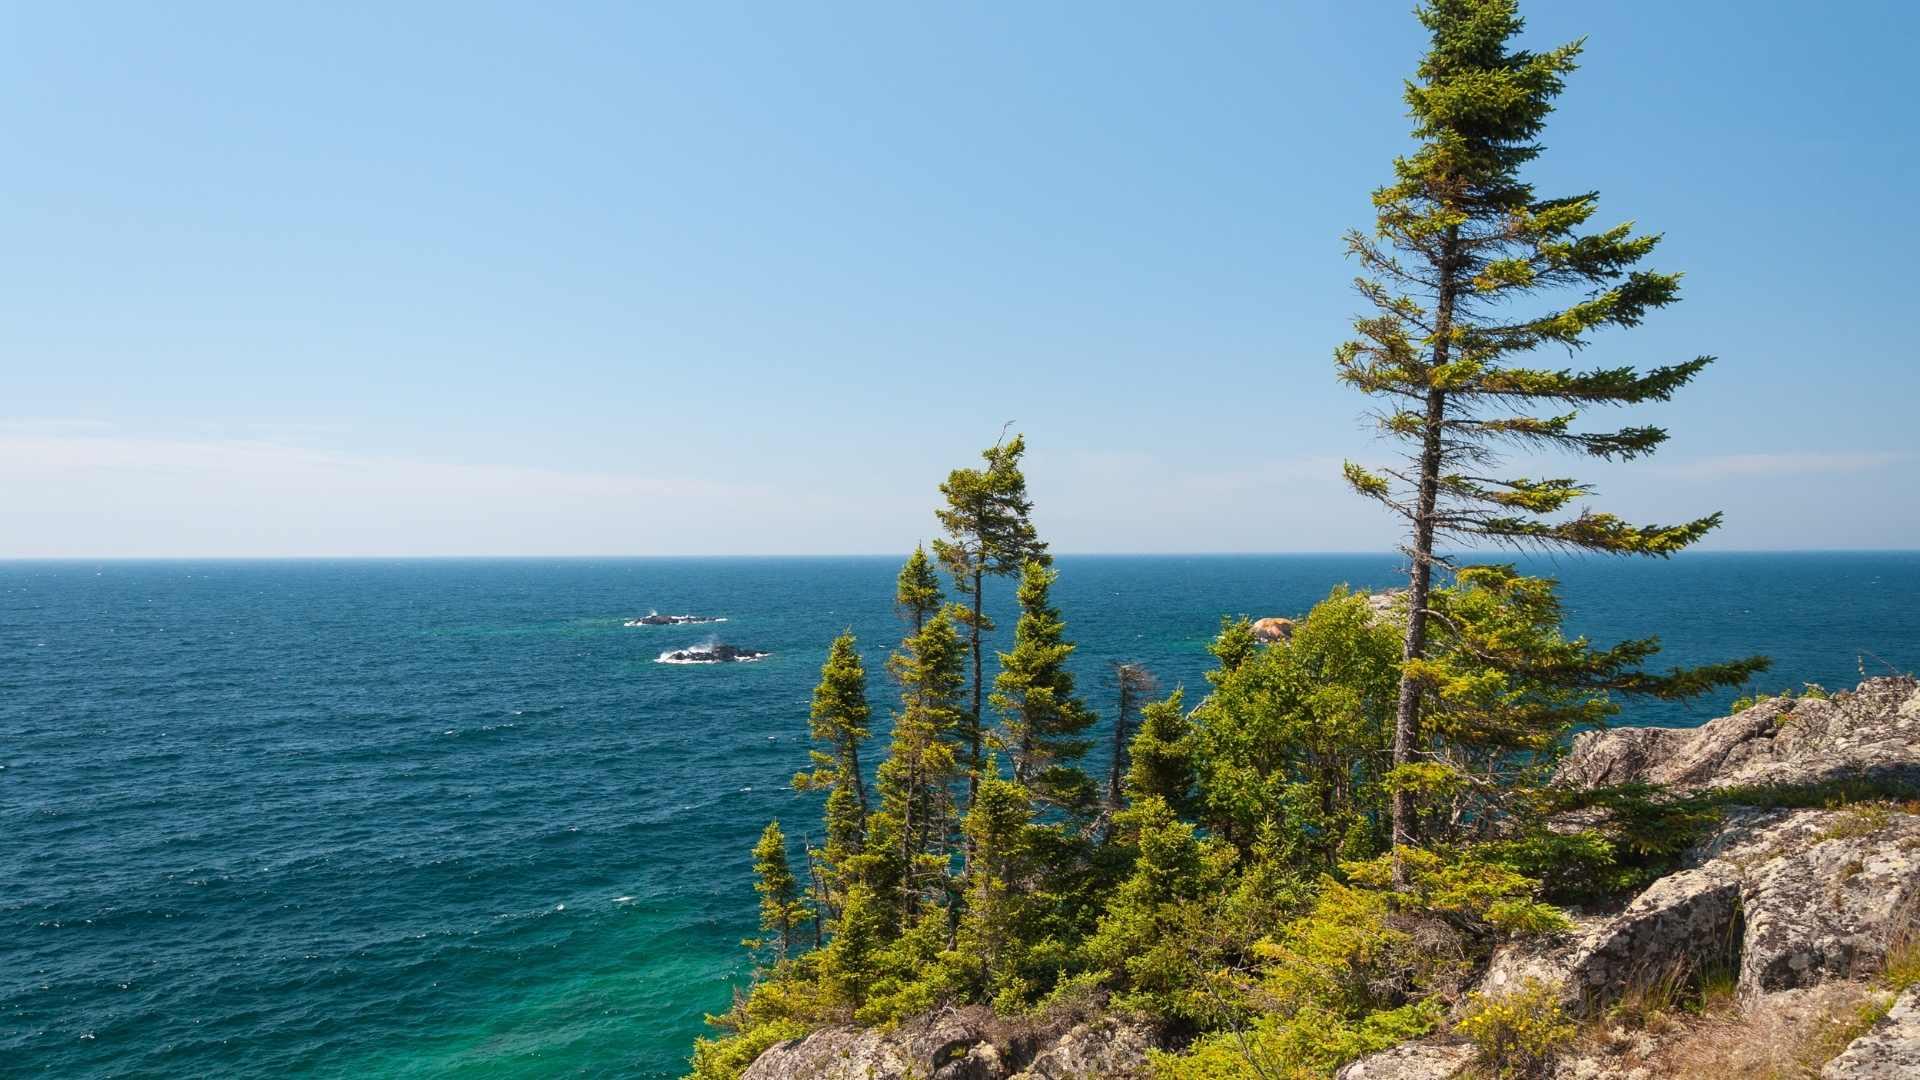 Great Lakes Cruise itinerary